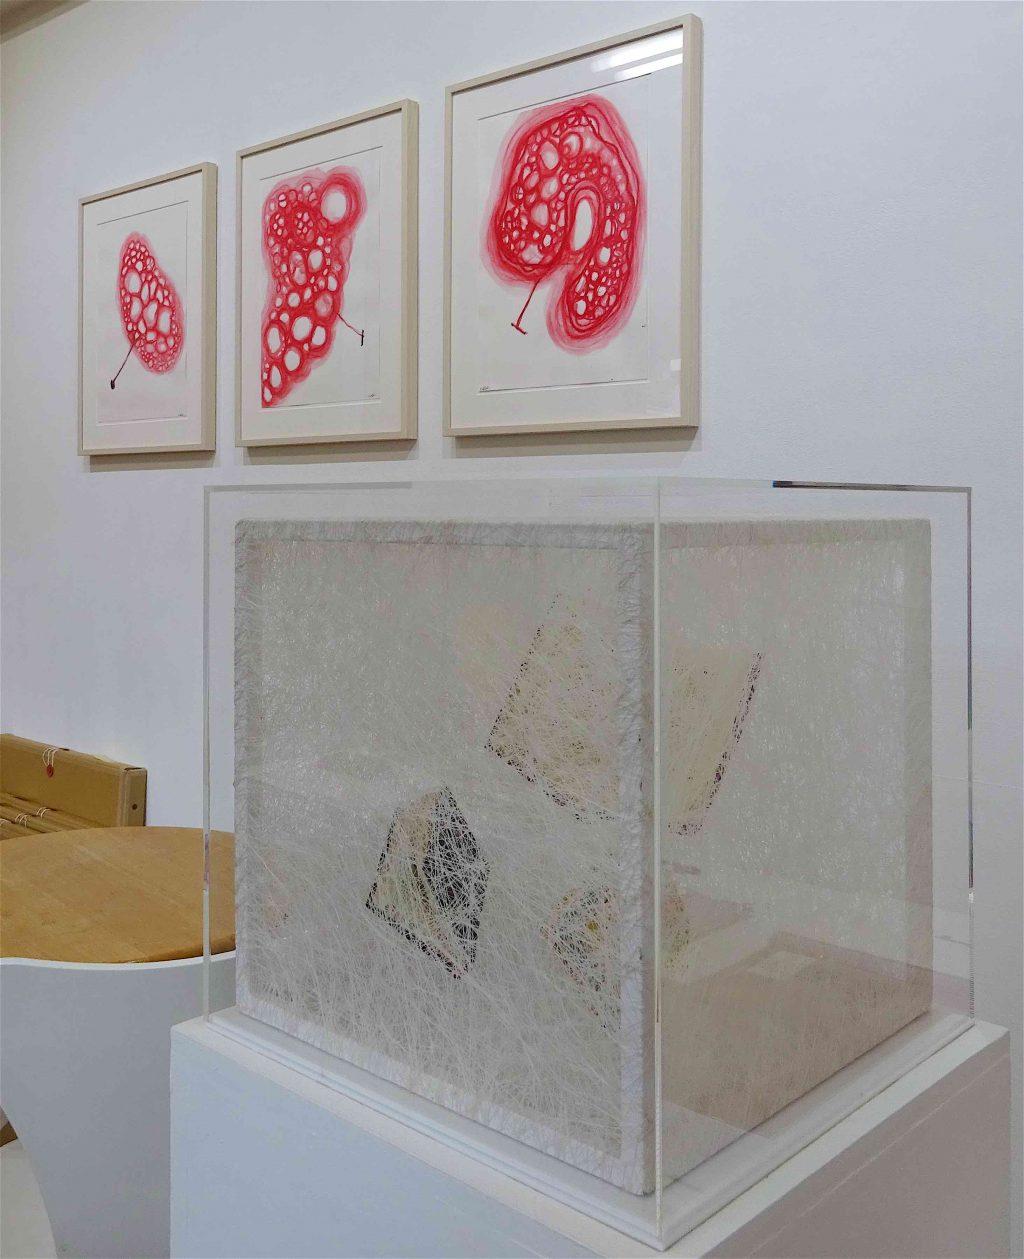 Works by SHIOTA Chiharu 塩田千春作 @ Kenji Taki Gallery ケンジタキギャラリー 2018